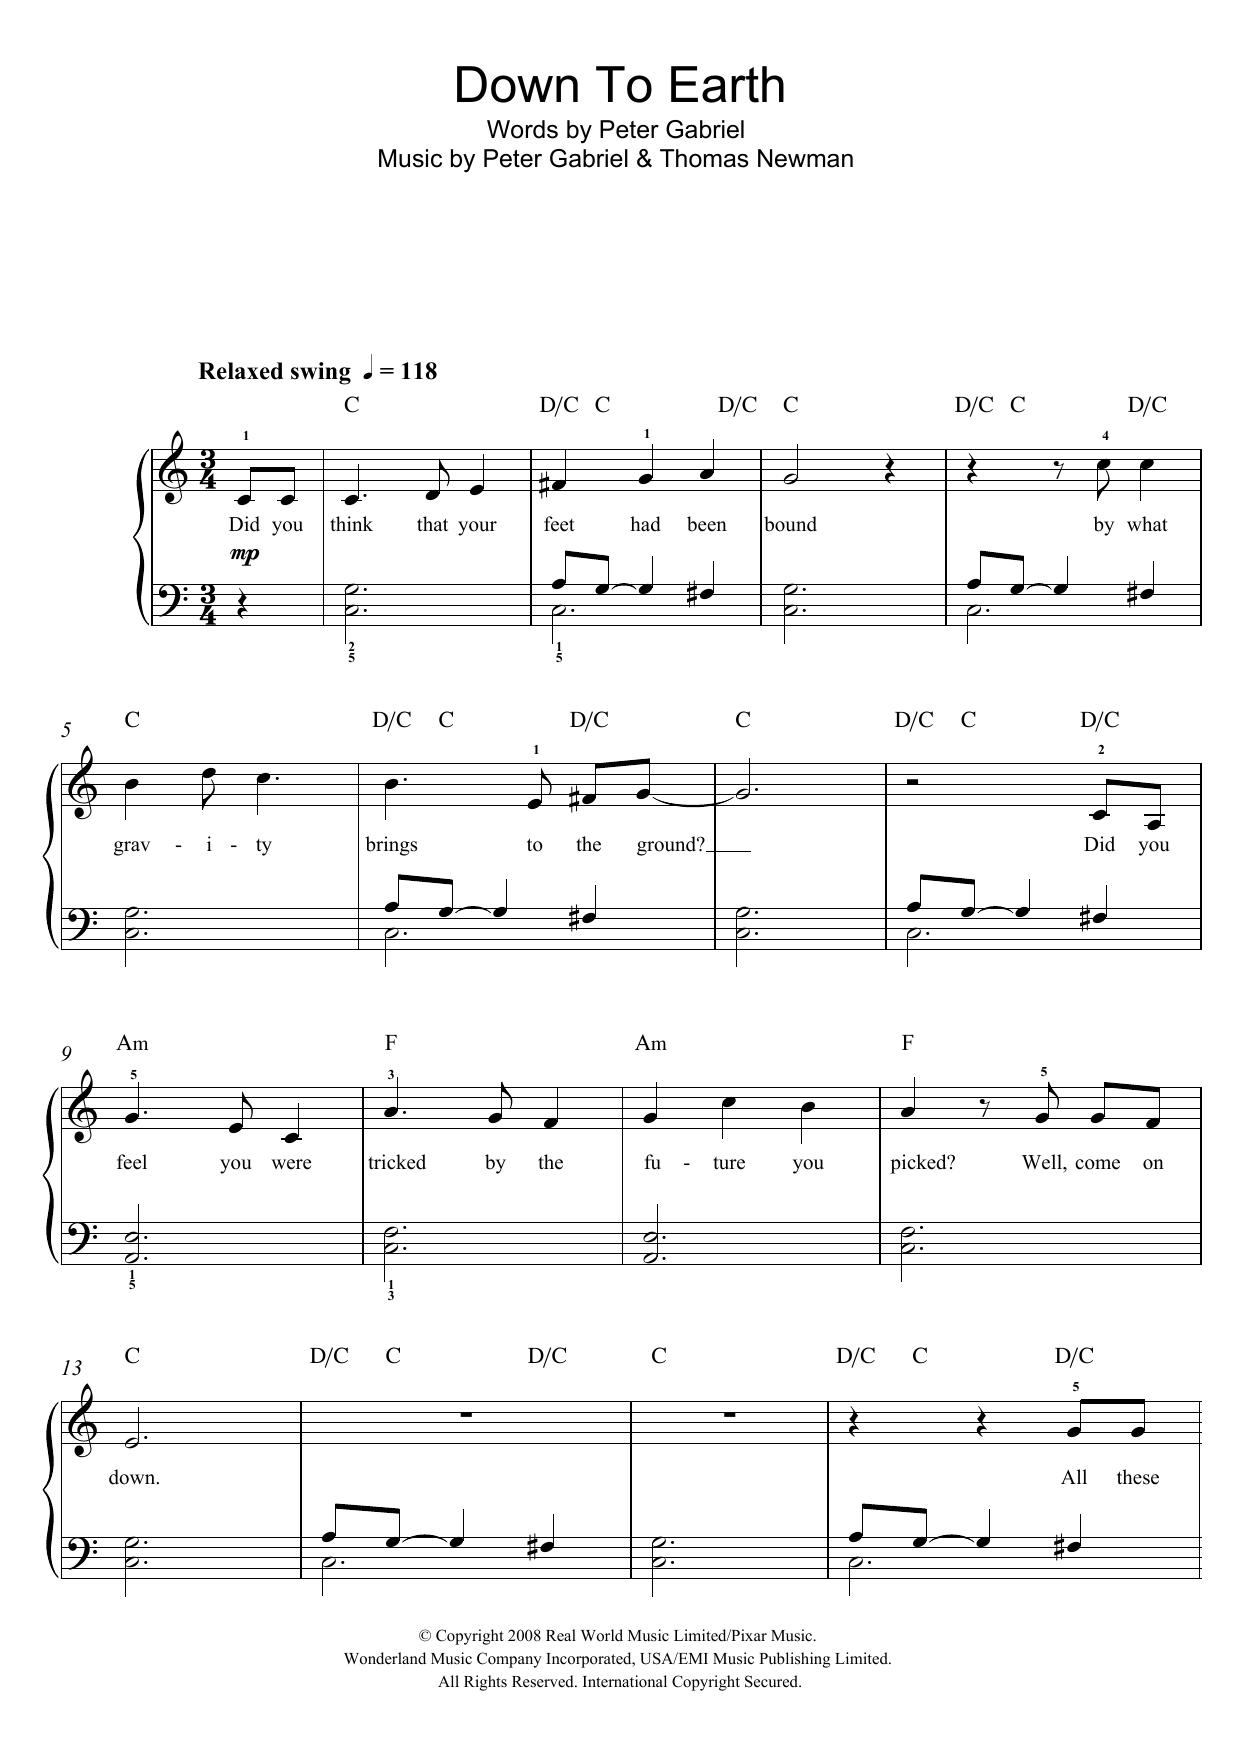 Peter Gabriel: Down To Earth (from 'WALLâ?¢E')